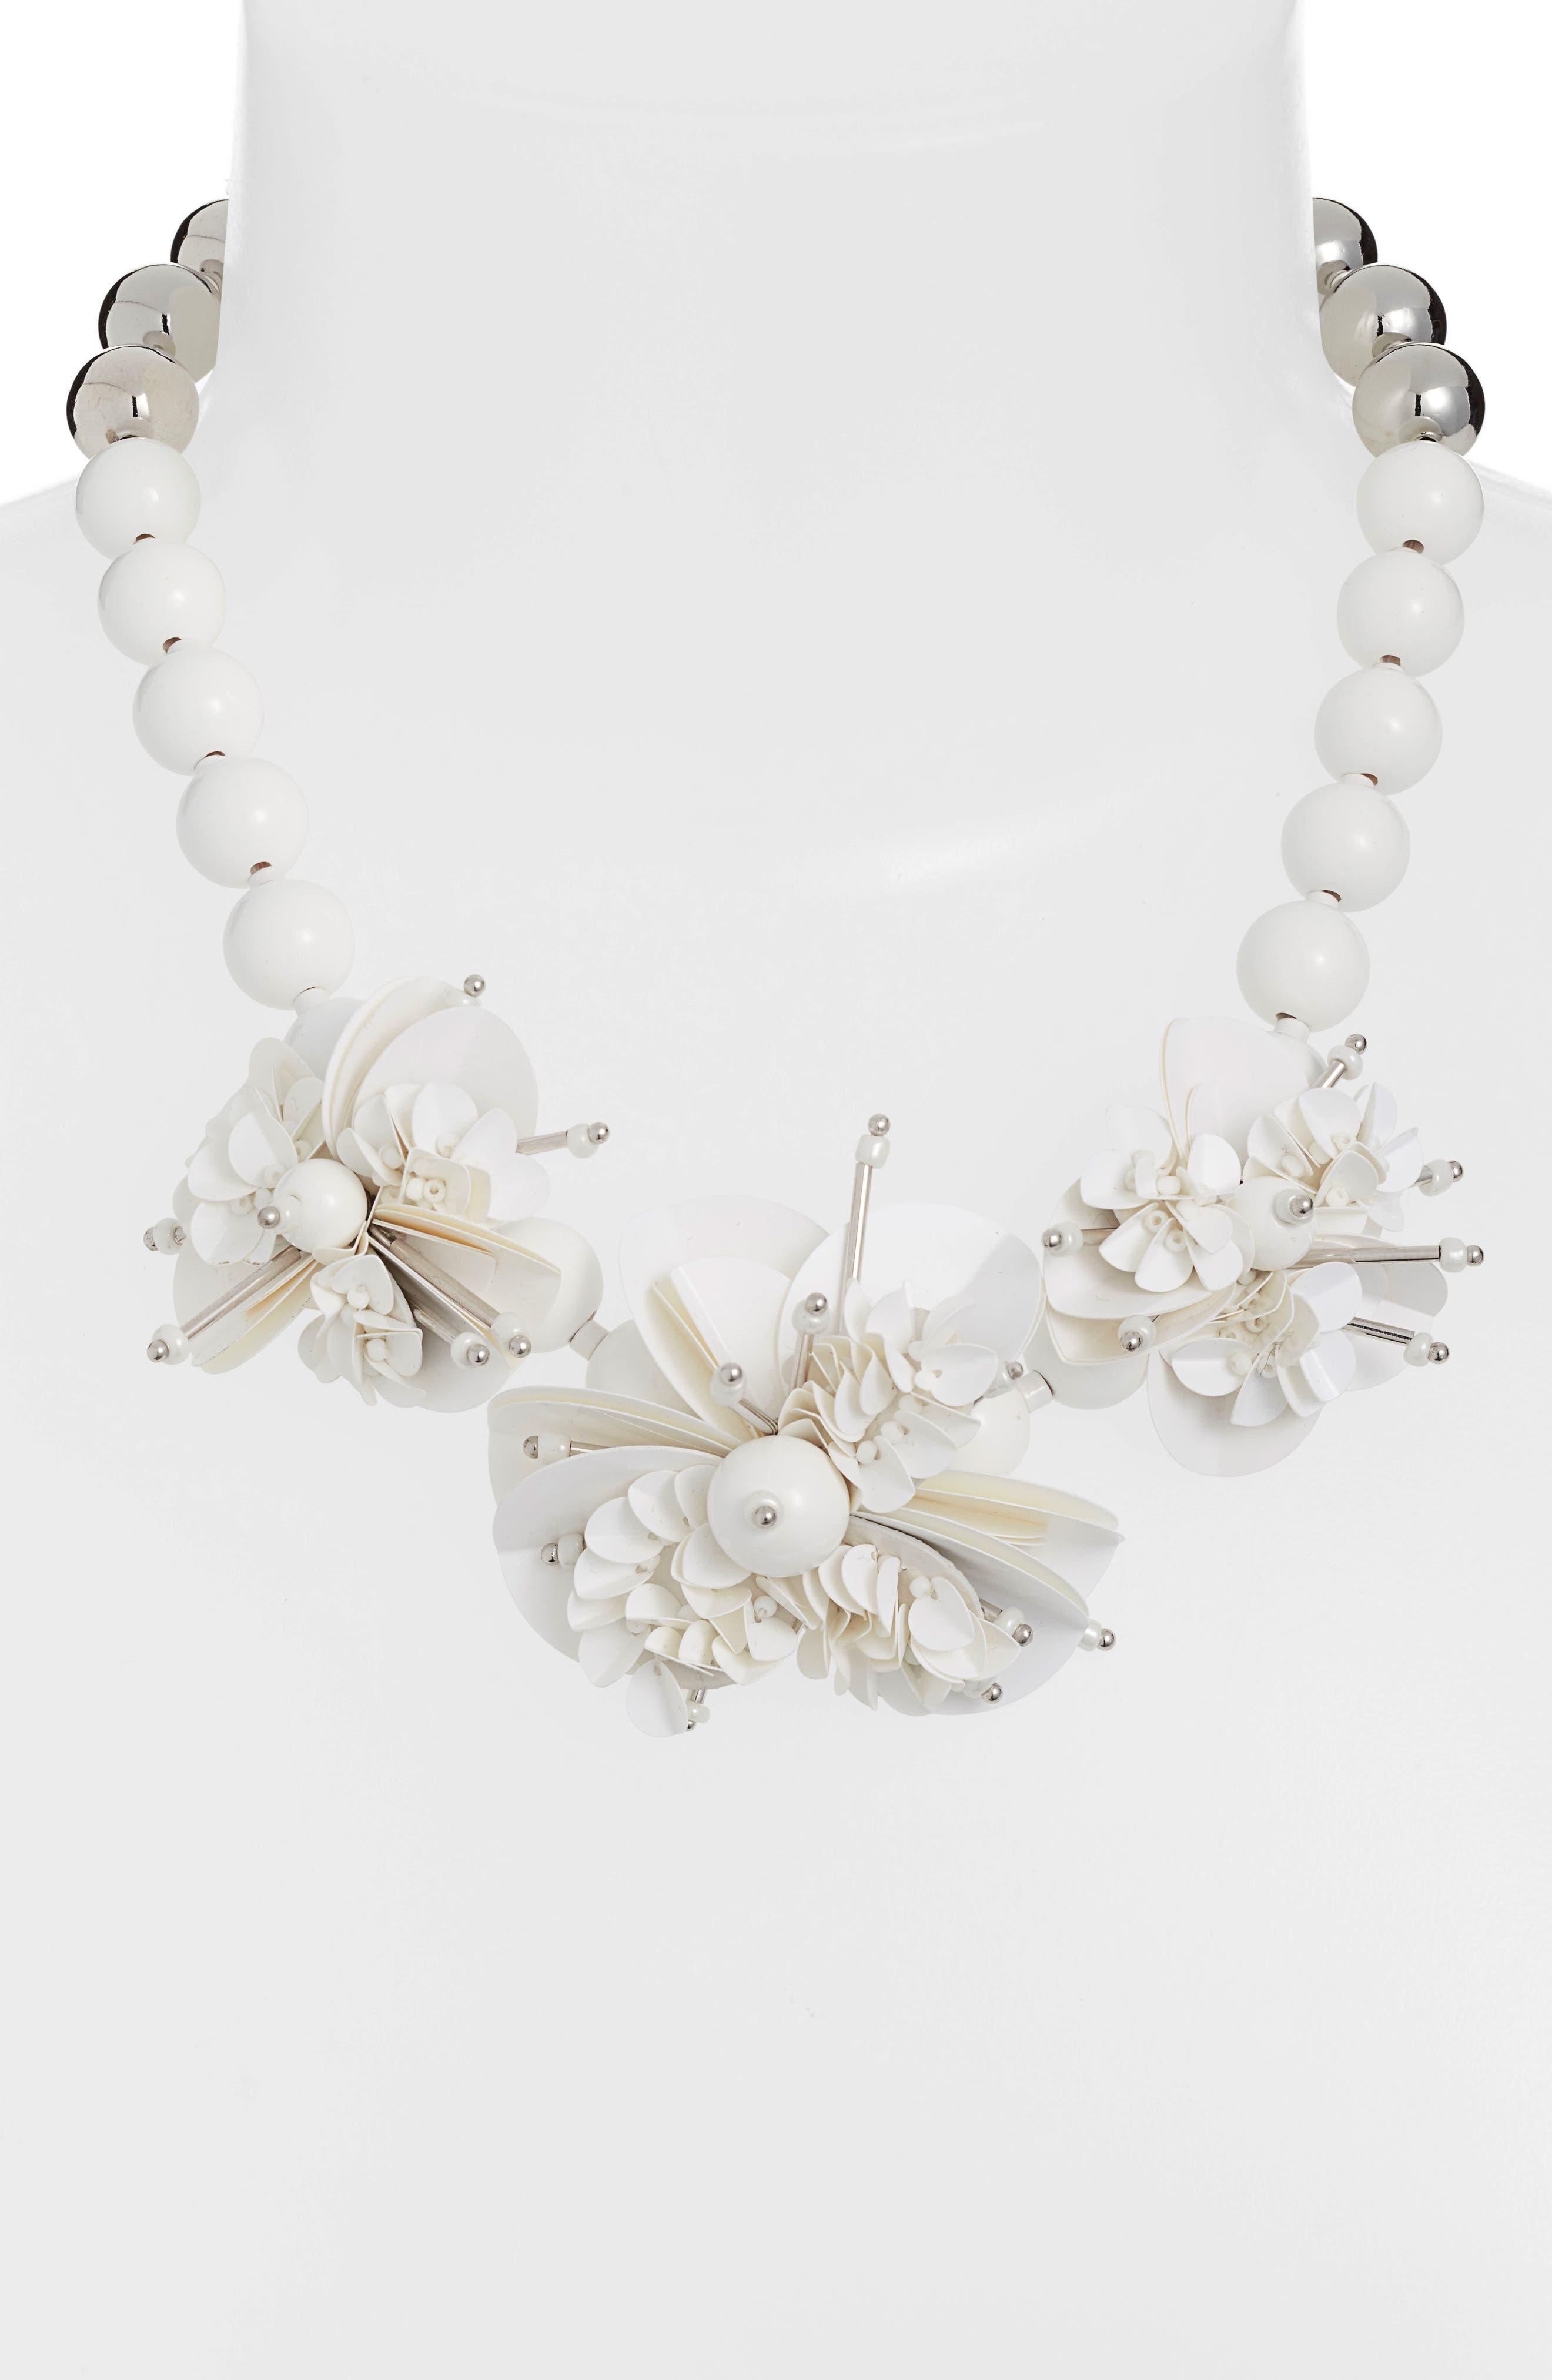 KATE SPADE NEW YORK,                             vibrant life statement necklace,                             Alternate thumbnail 2, color,                             WHITE MULTI